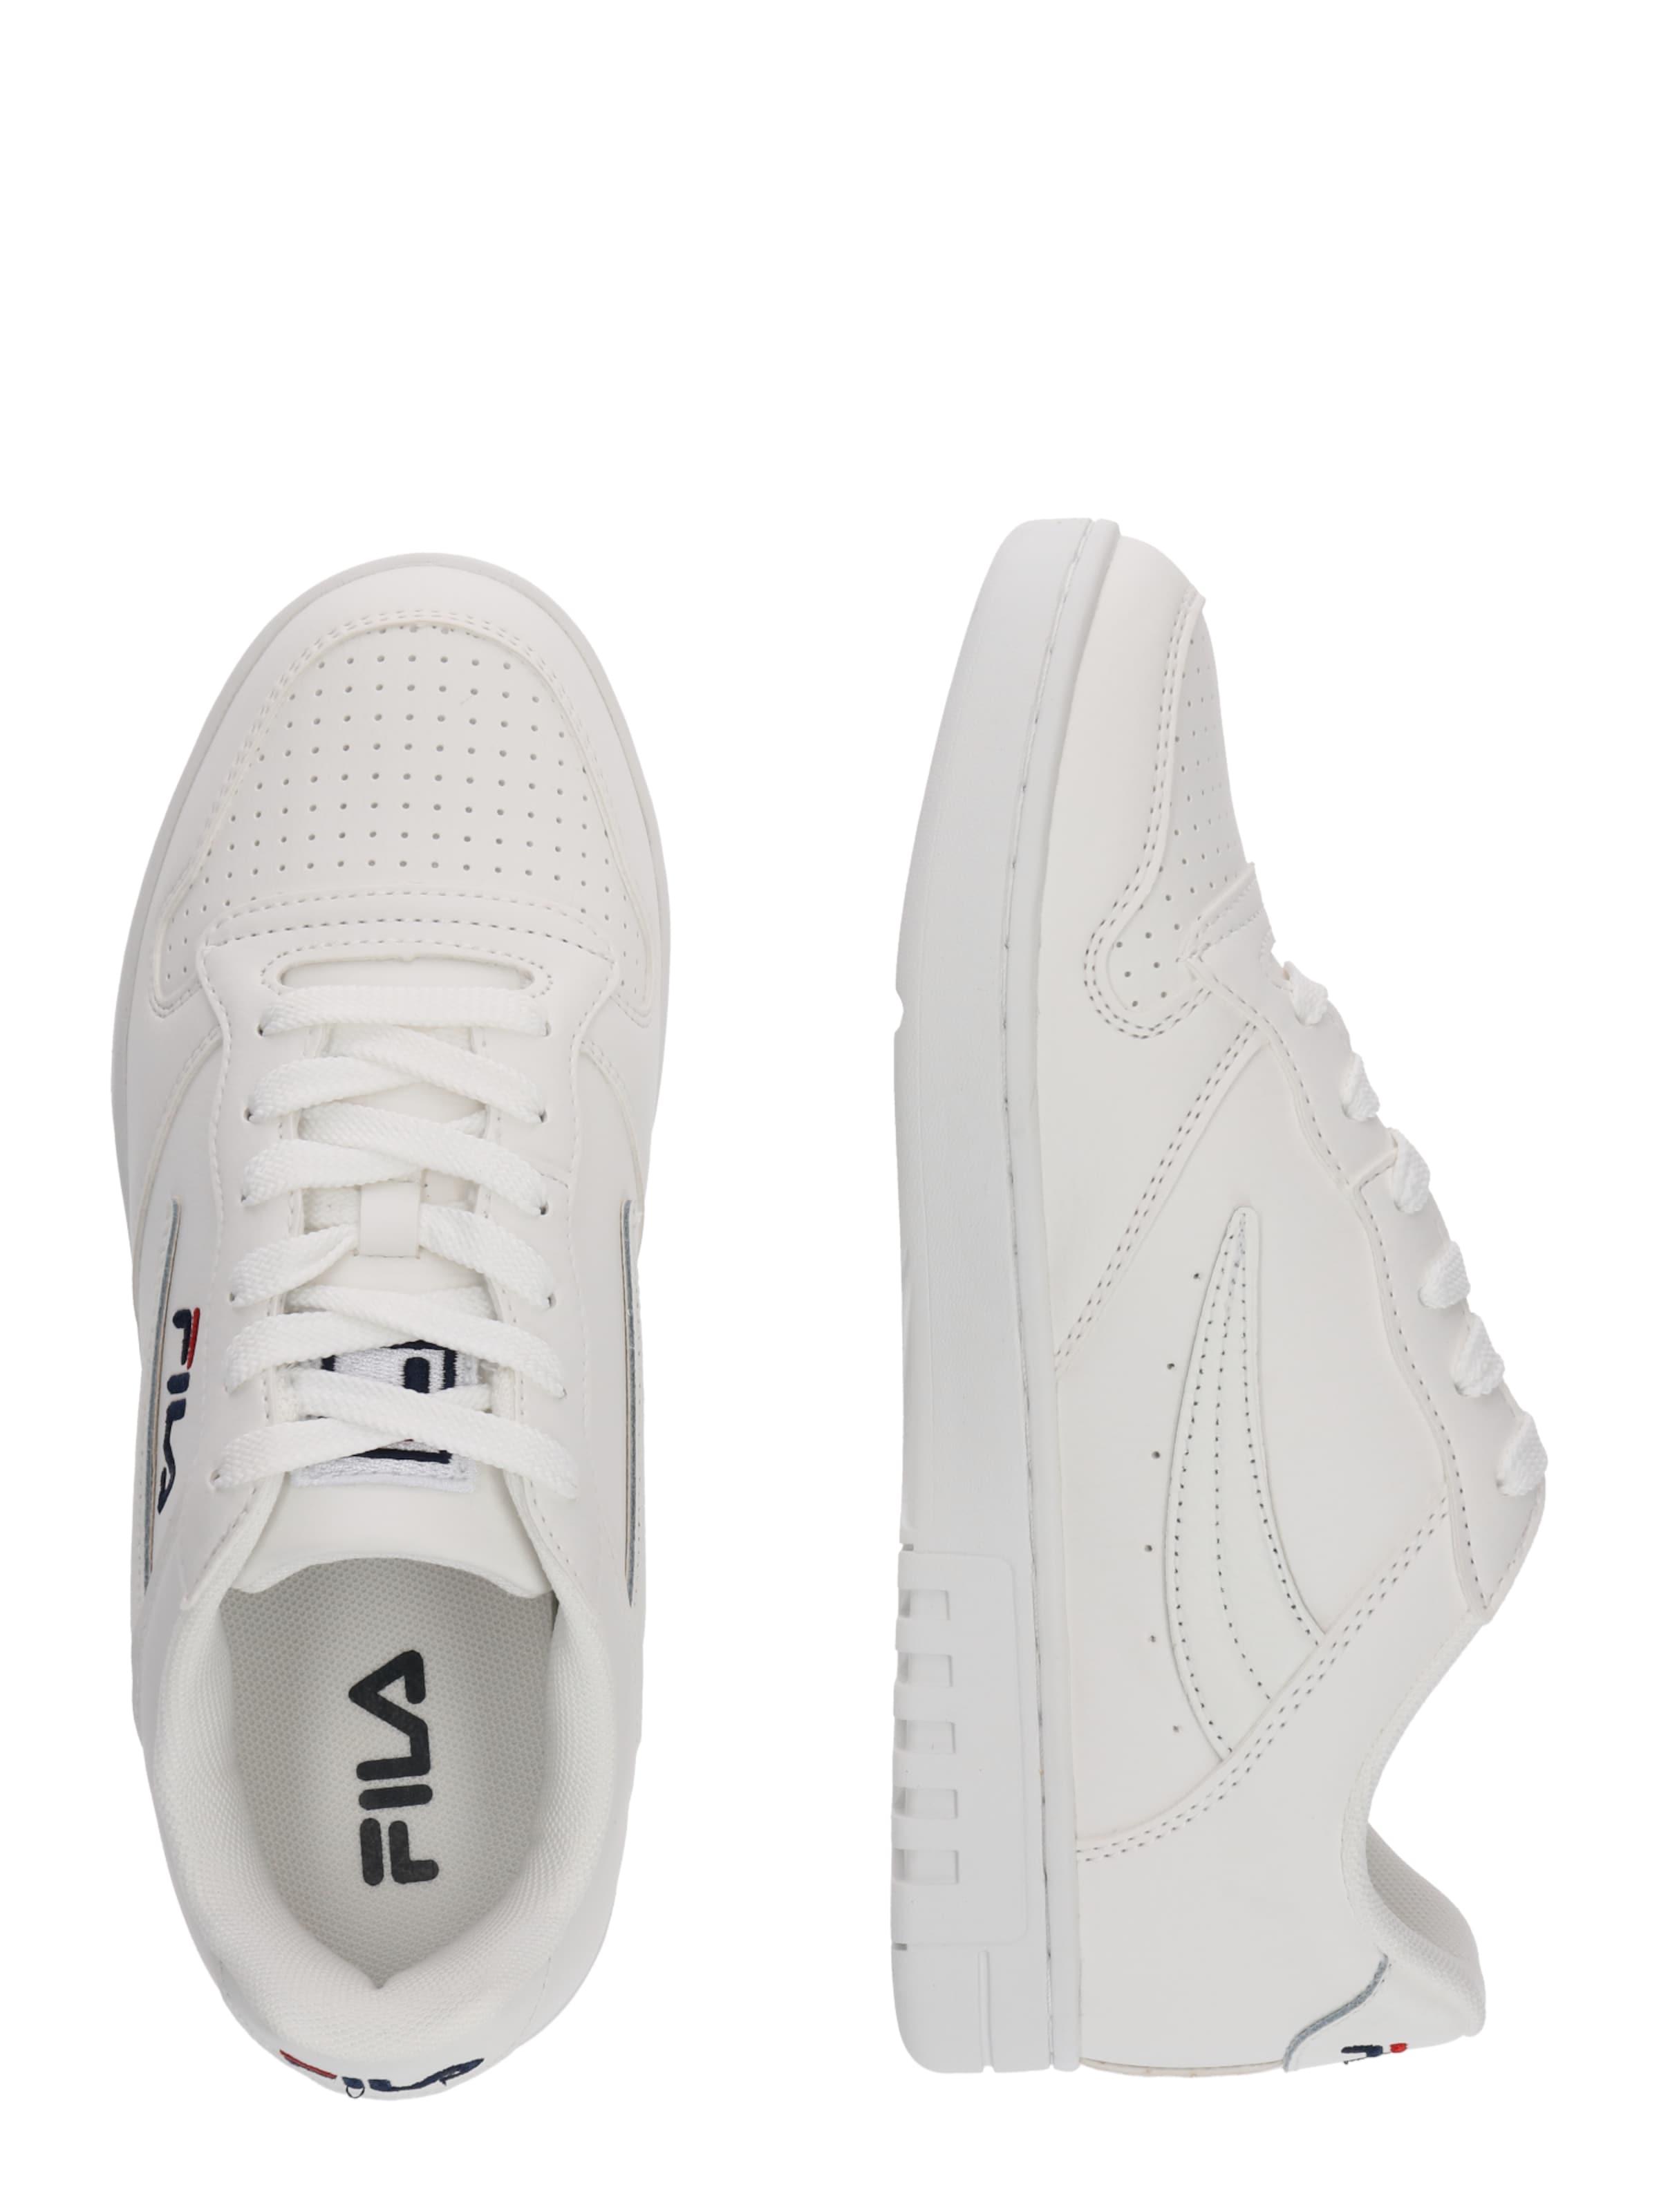 F Weiß Wmn' 'fx100 In Fila Low Sneaker sdChxoBtQr